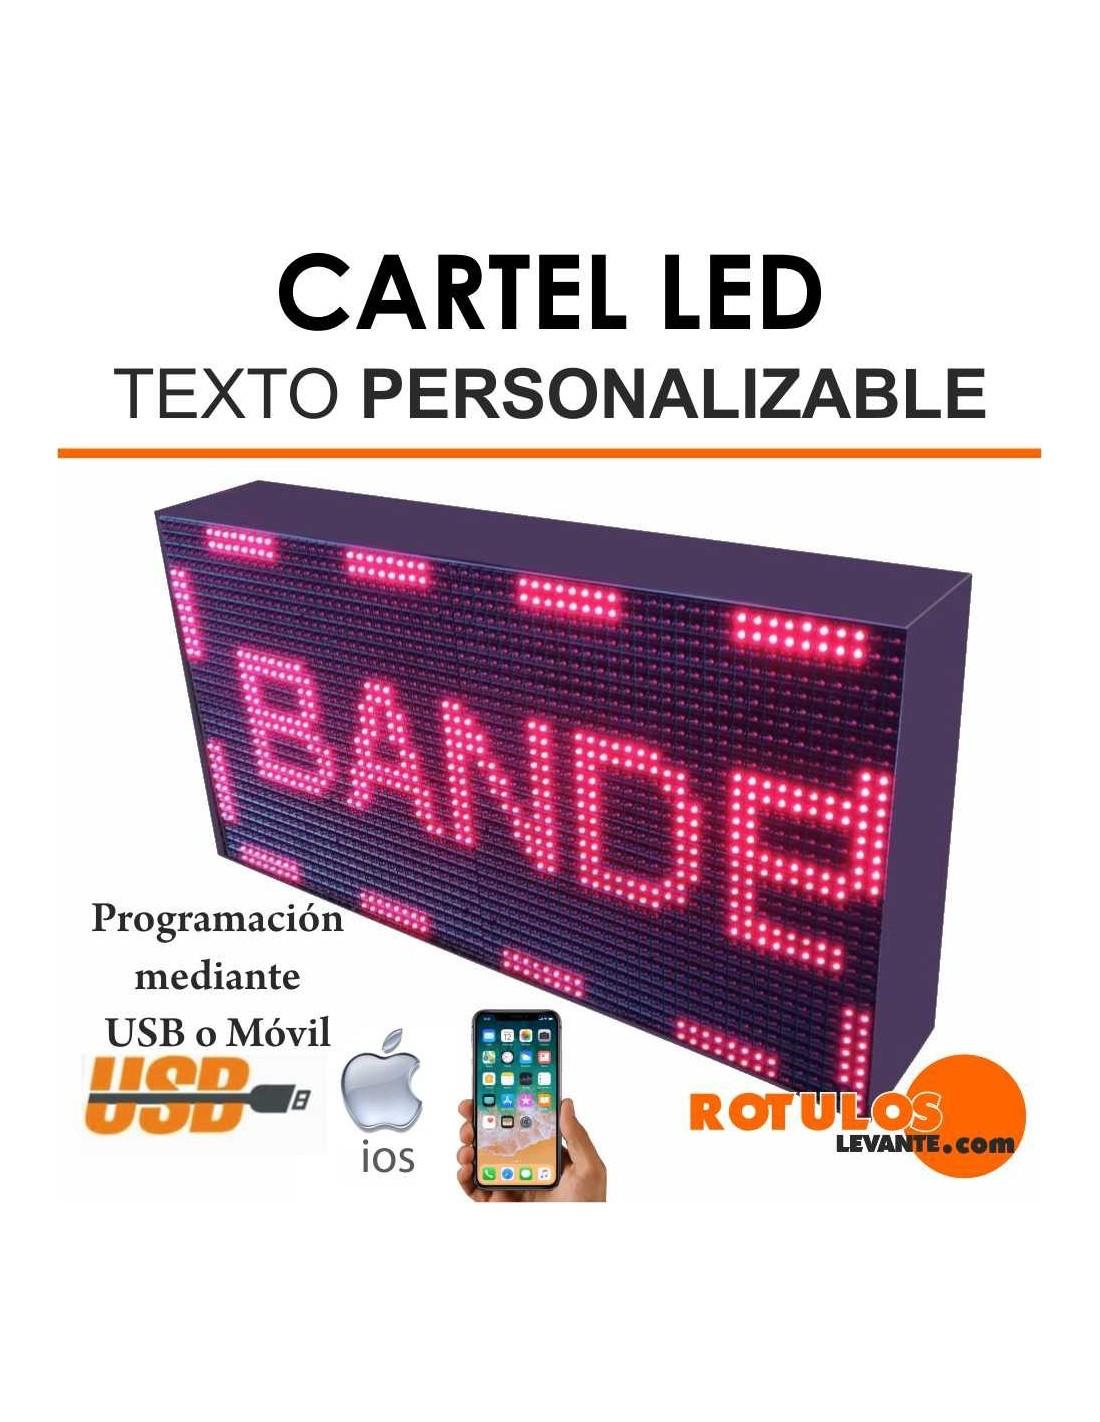 Cartel LED con Texto Personalizable